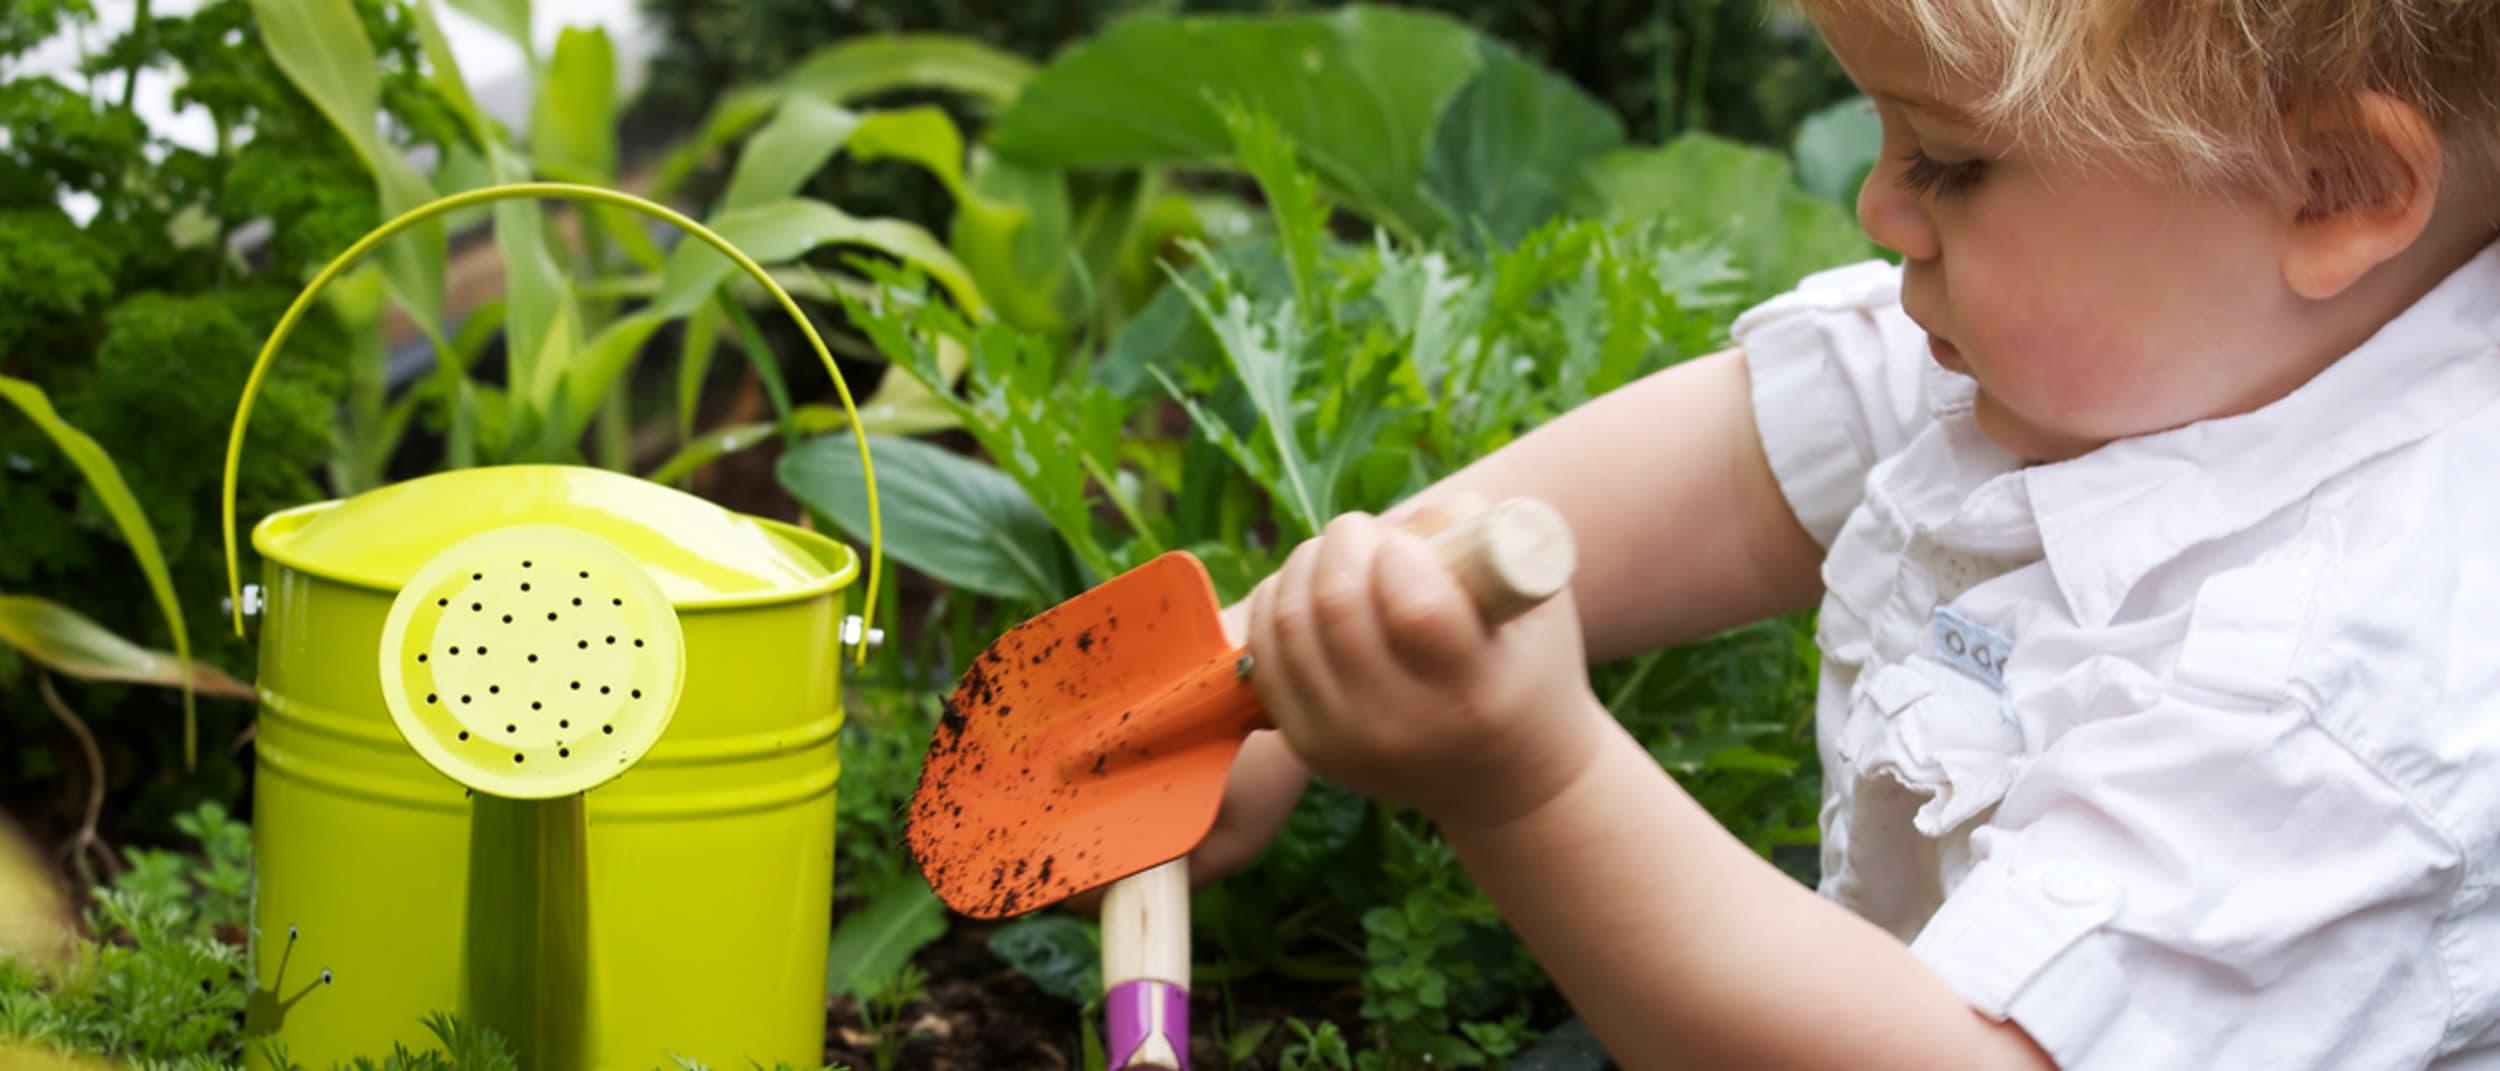 Kidstuff: fun outdoor activity ideas for kids